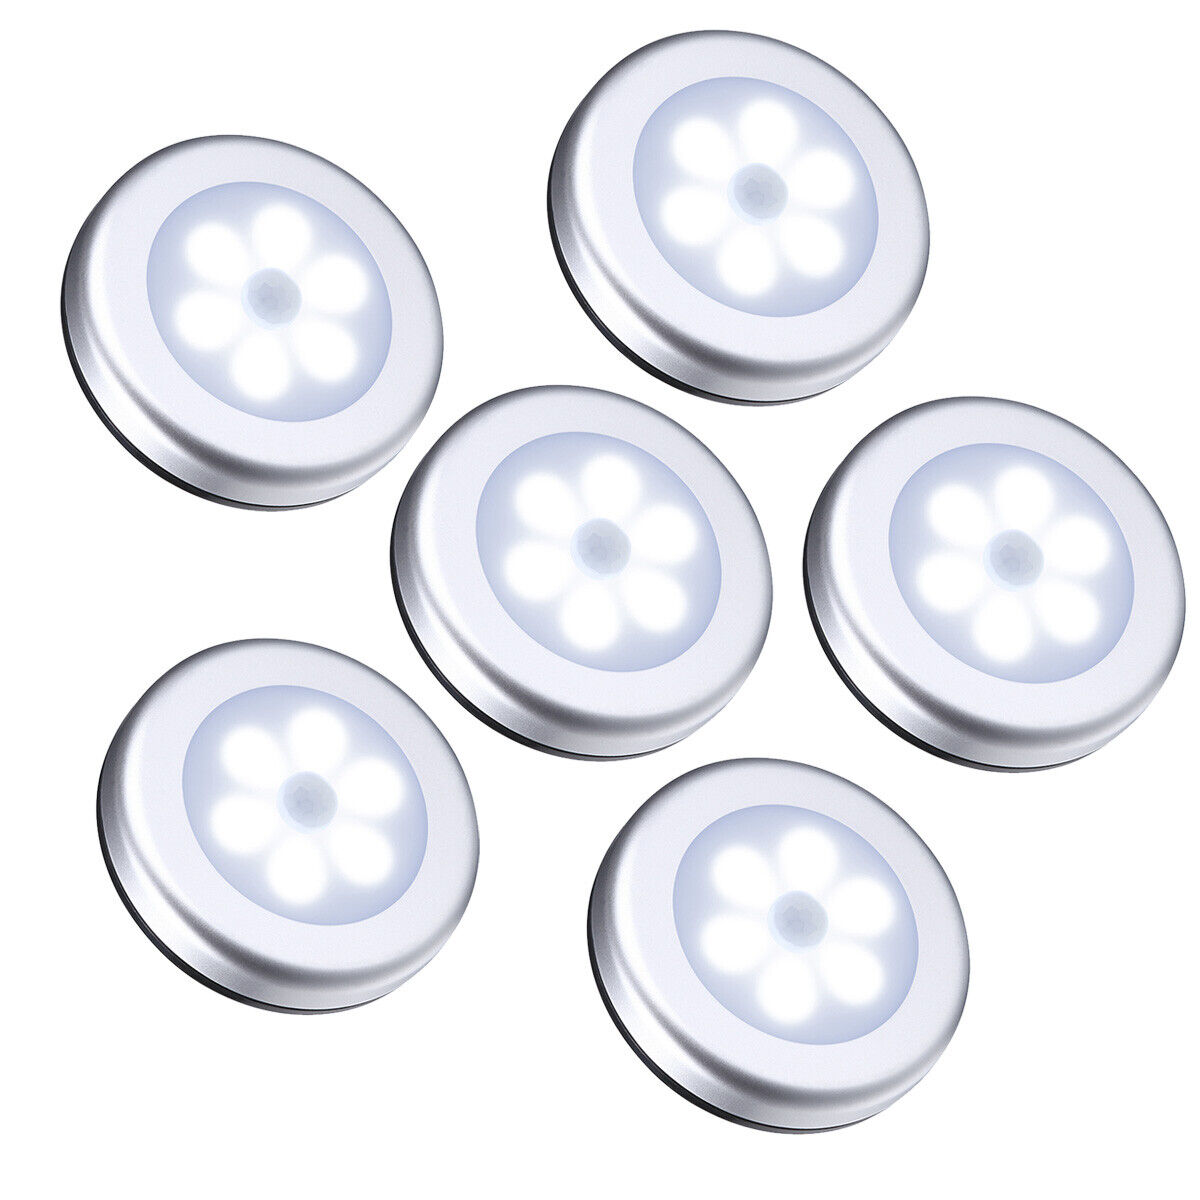 6pcs Led Pir Motion Sensor Wireless Night Lights Battery